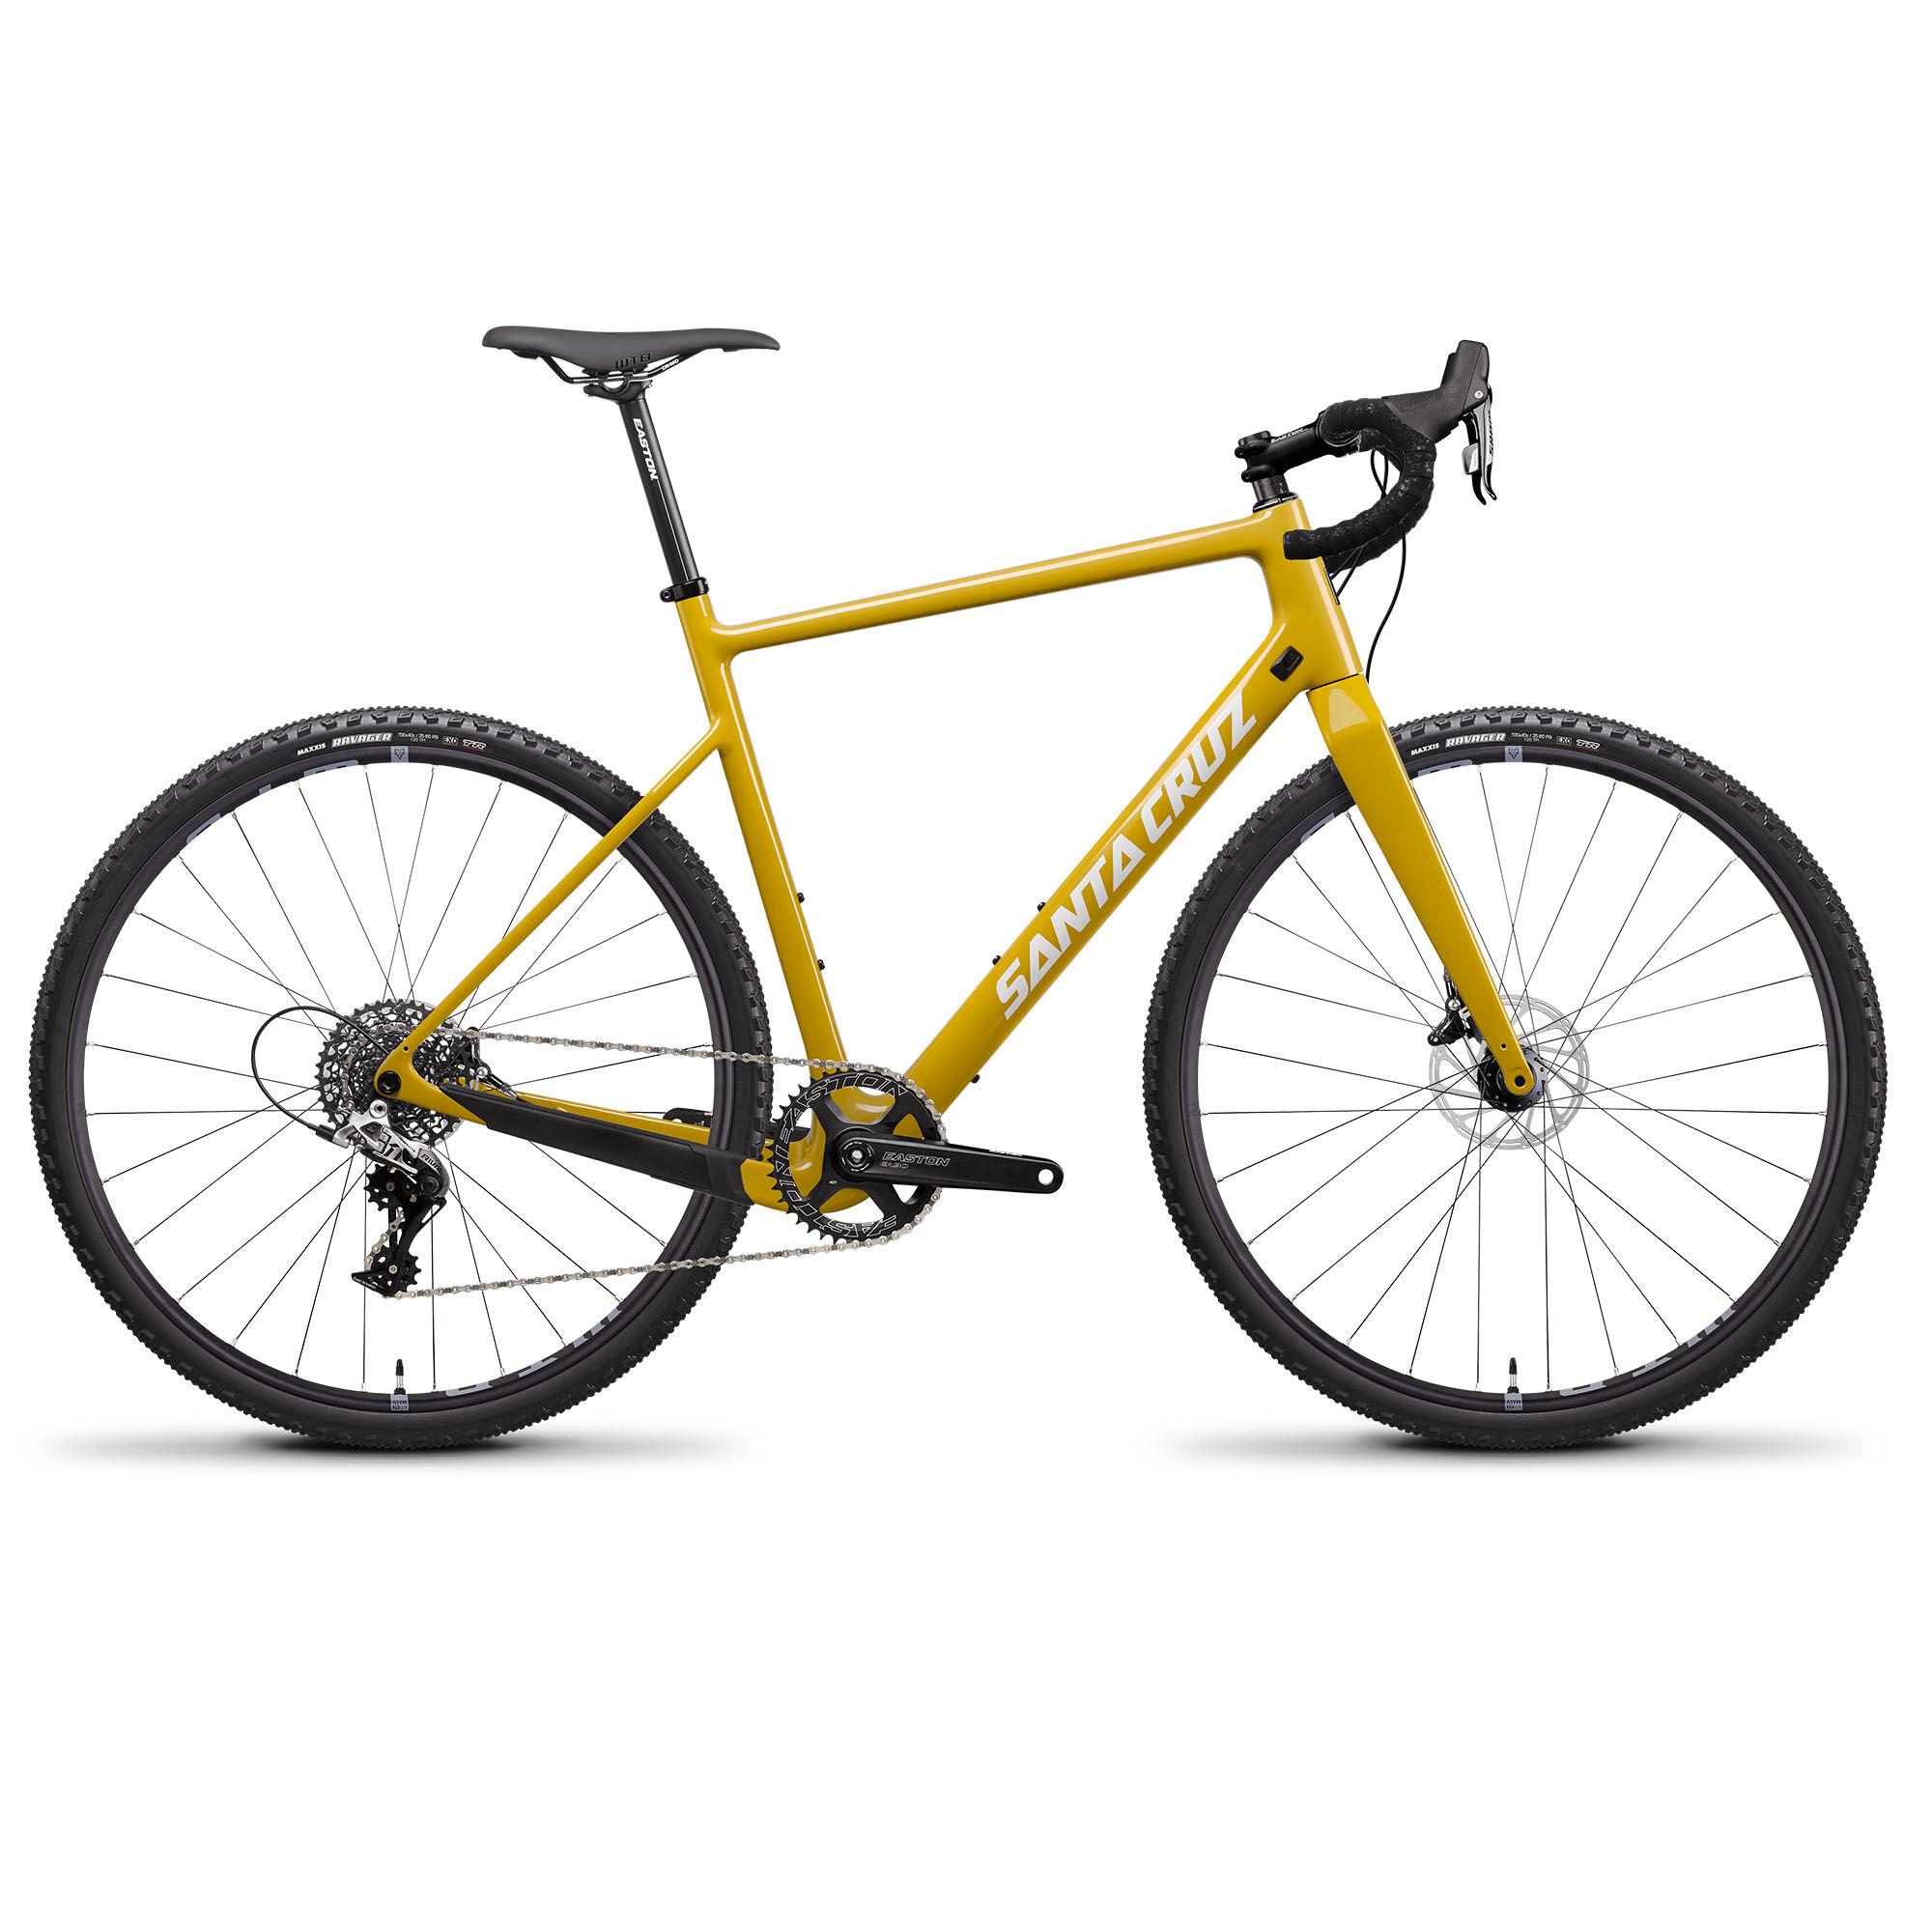 Santa Cruz Men's Stigmata 3.0 CC Rival Gravel Bike '20  - Mustard - Size: 52